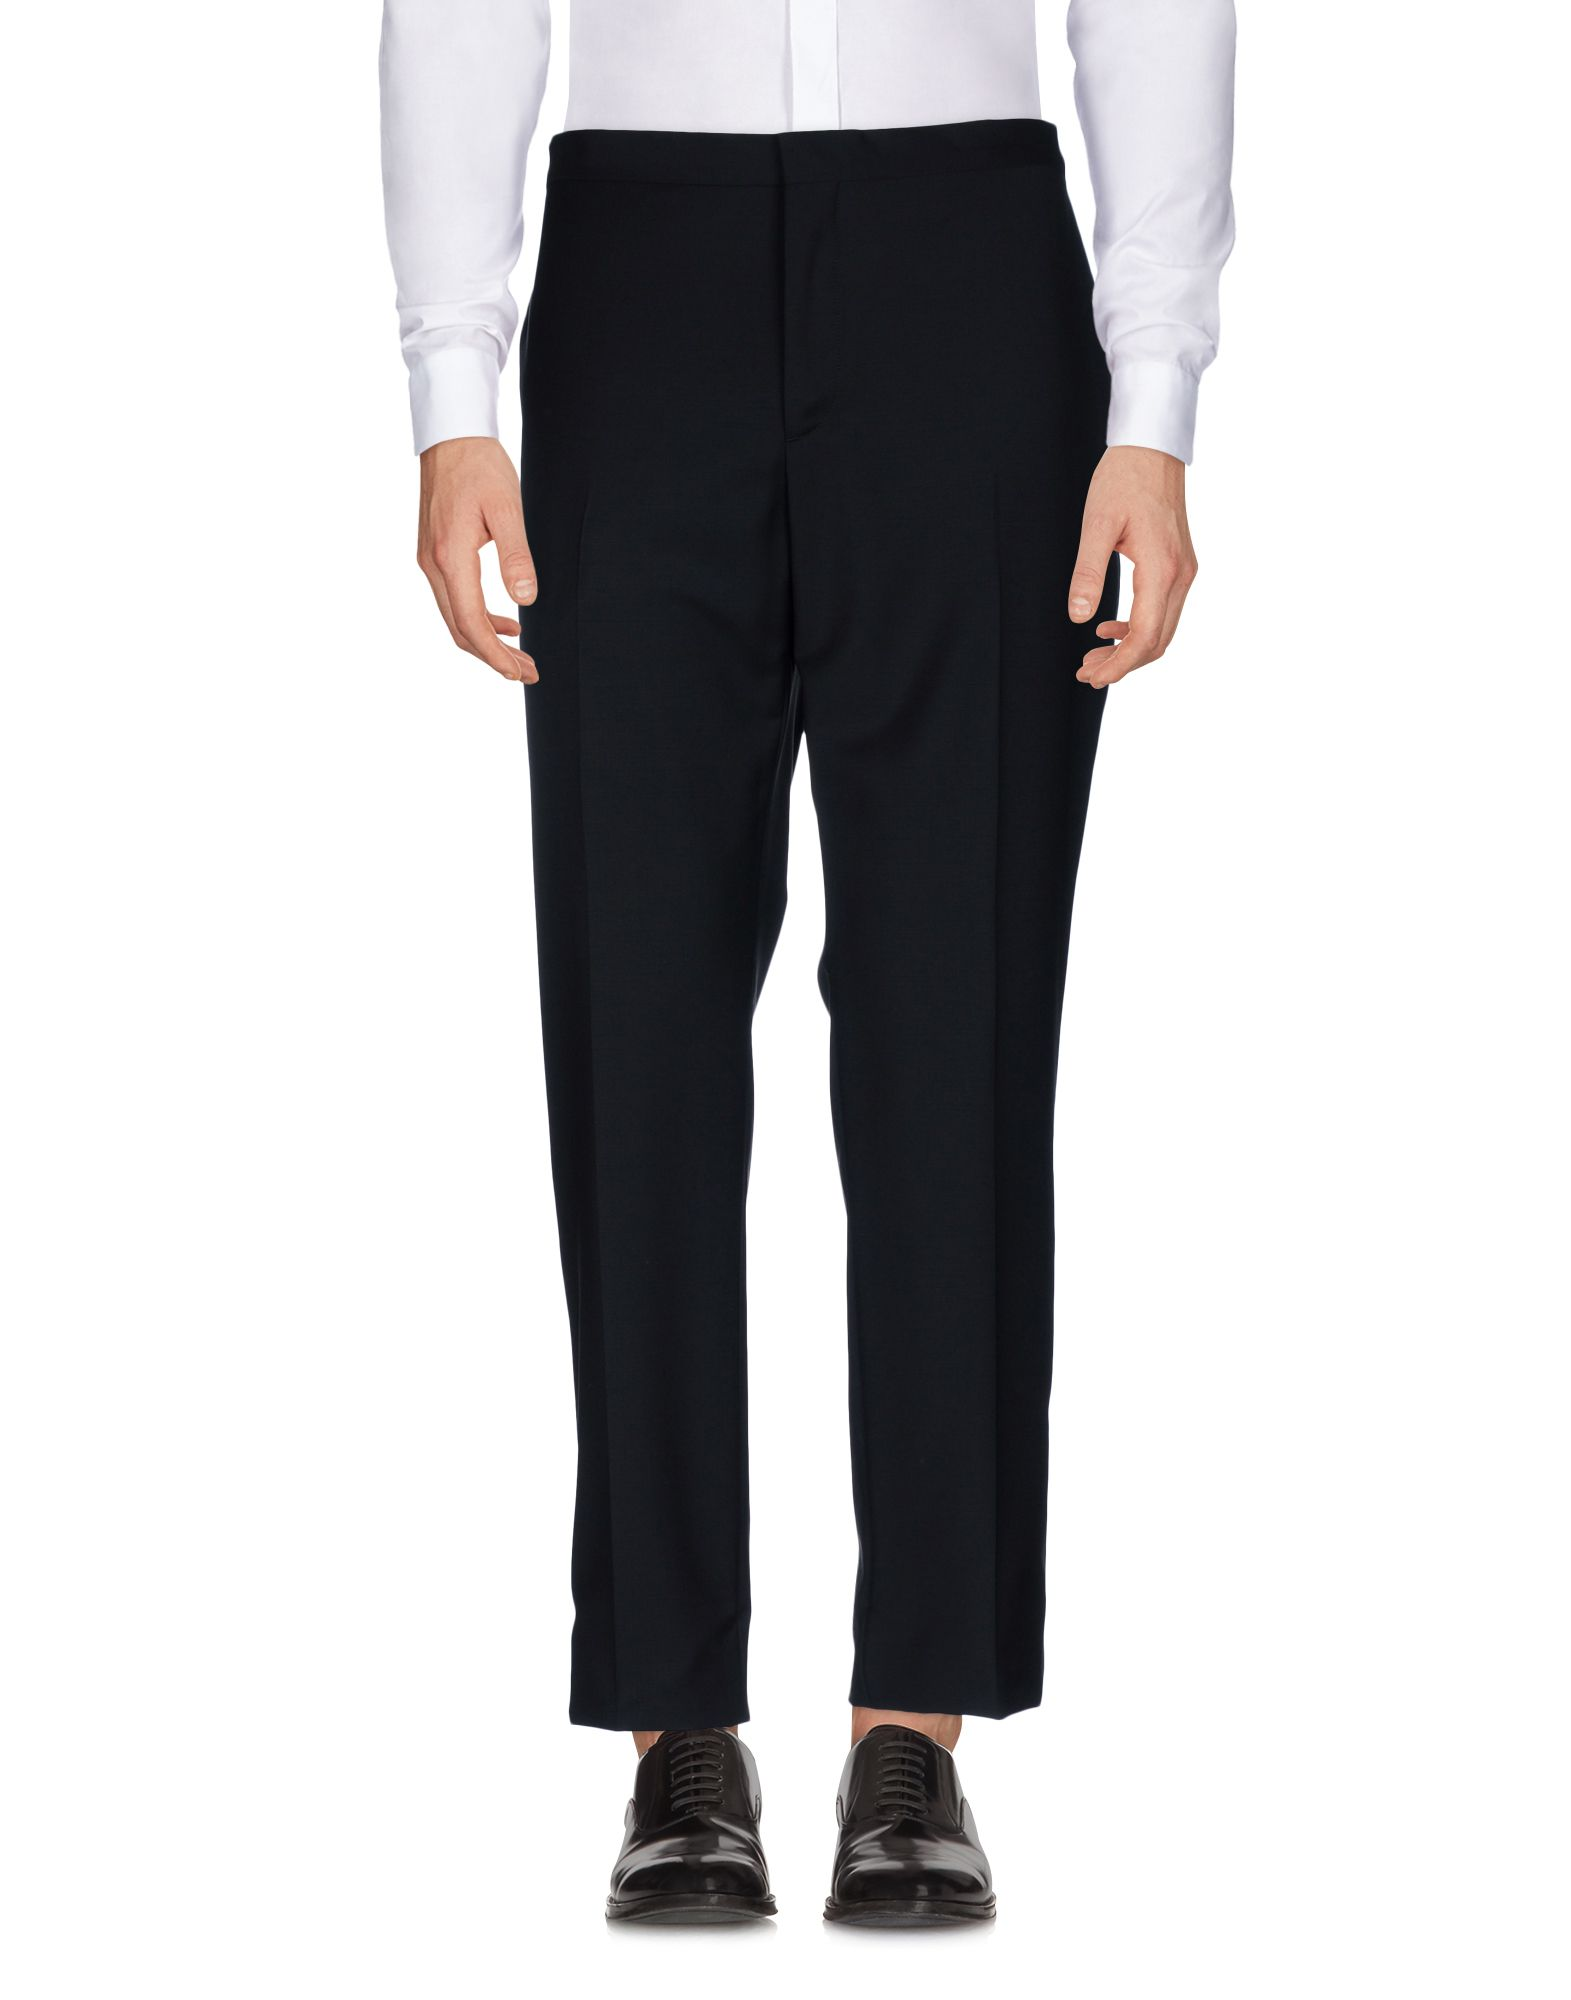 Pantalone Hackett Donna - Acquista online su